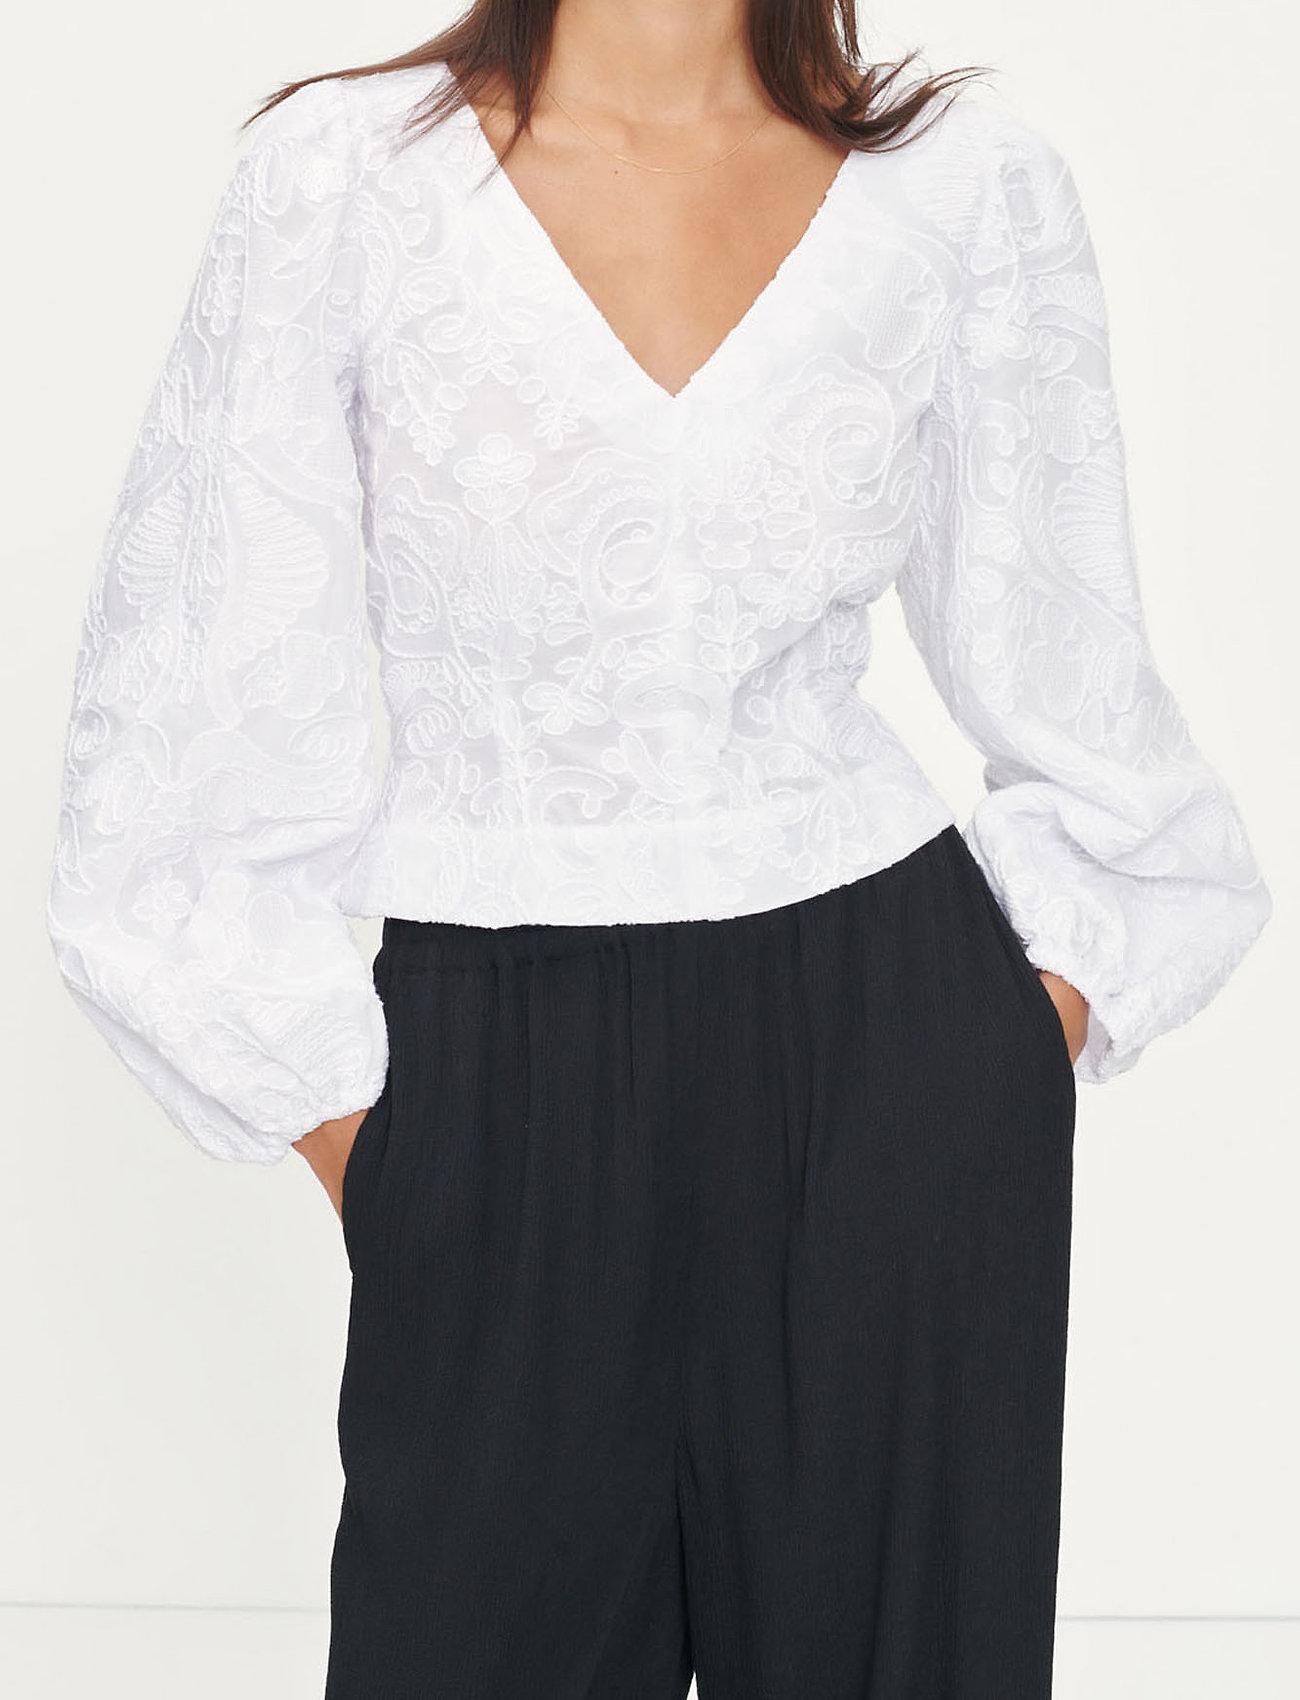 Samsøe Samsøe - Anai blouse 13089 - long sleeved blouses - bright white - 0